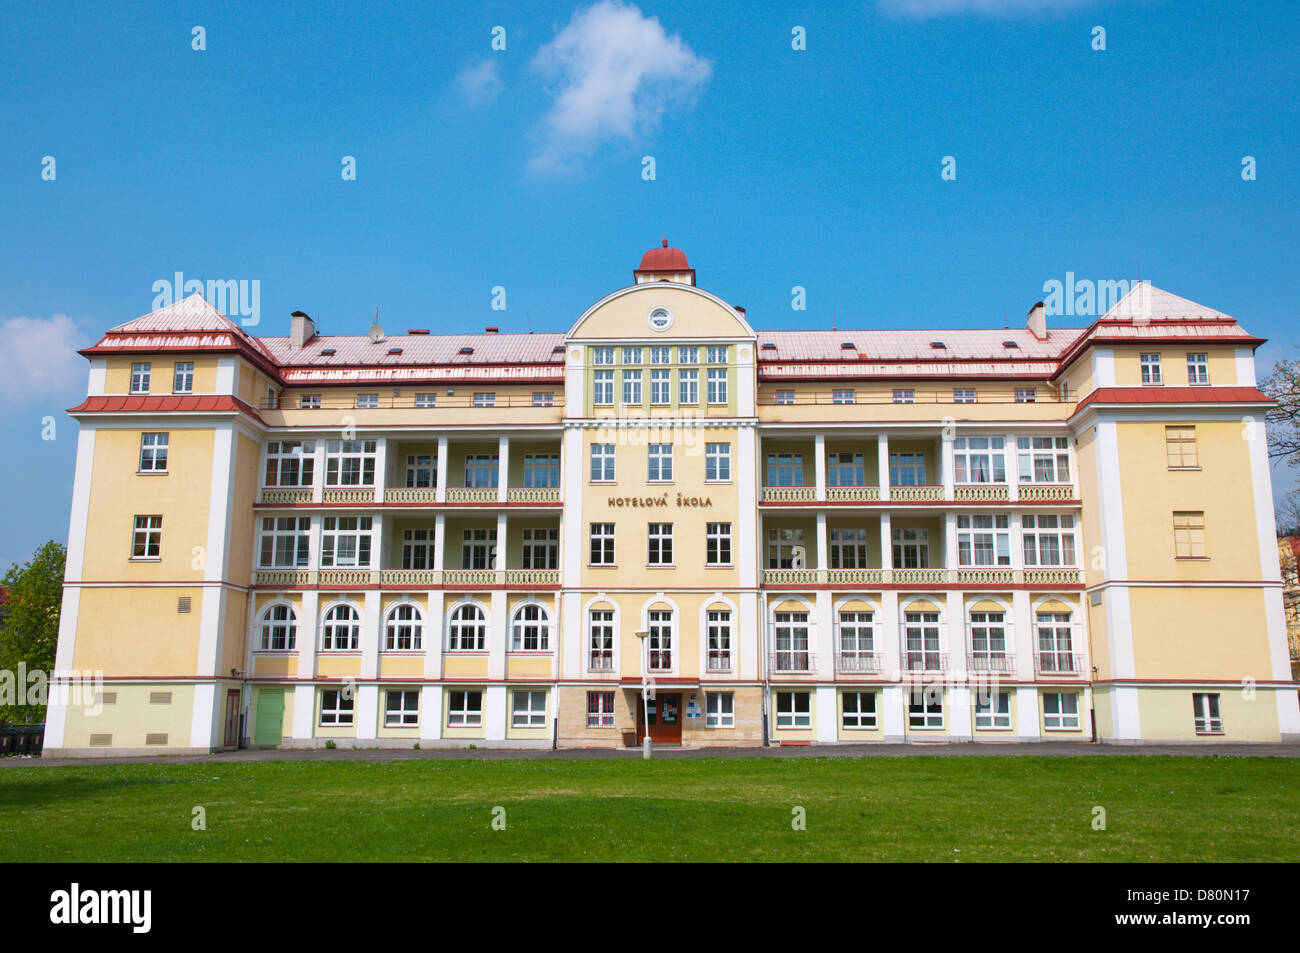 Hotelova skola the hotel industry high school Marianske Lazne aka Marienbad spa town Karlovy vary region Czech Republic - Stock Image